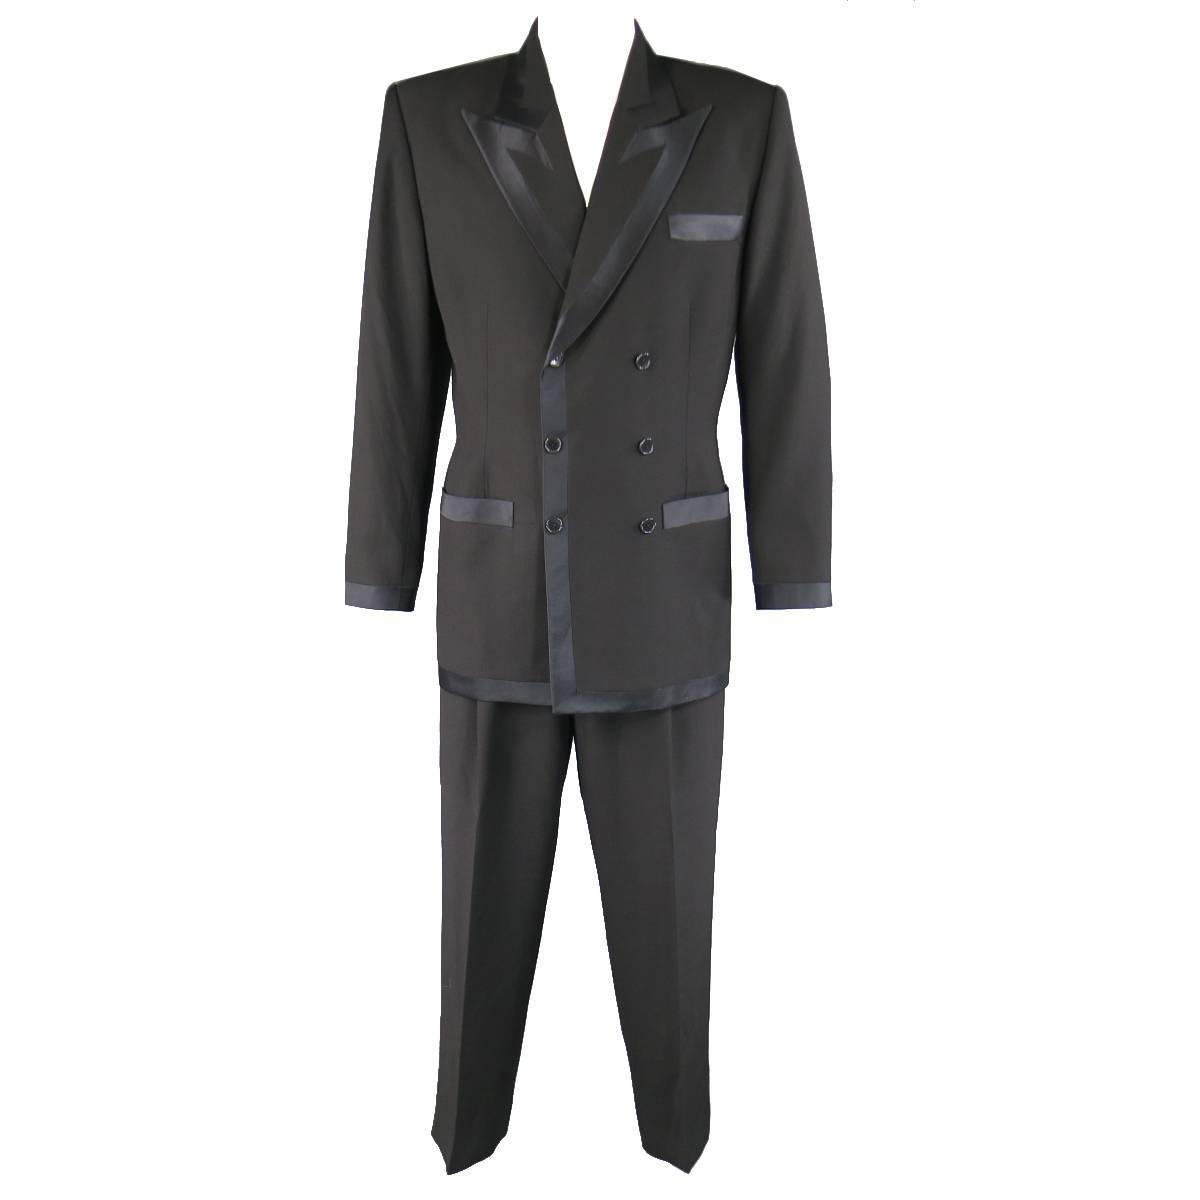 RICHARD TYLER 42 Black Satin Trim Double Breasted Satin Trim Peak Lapel Tuxedo